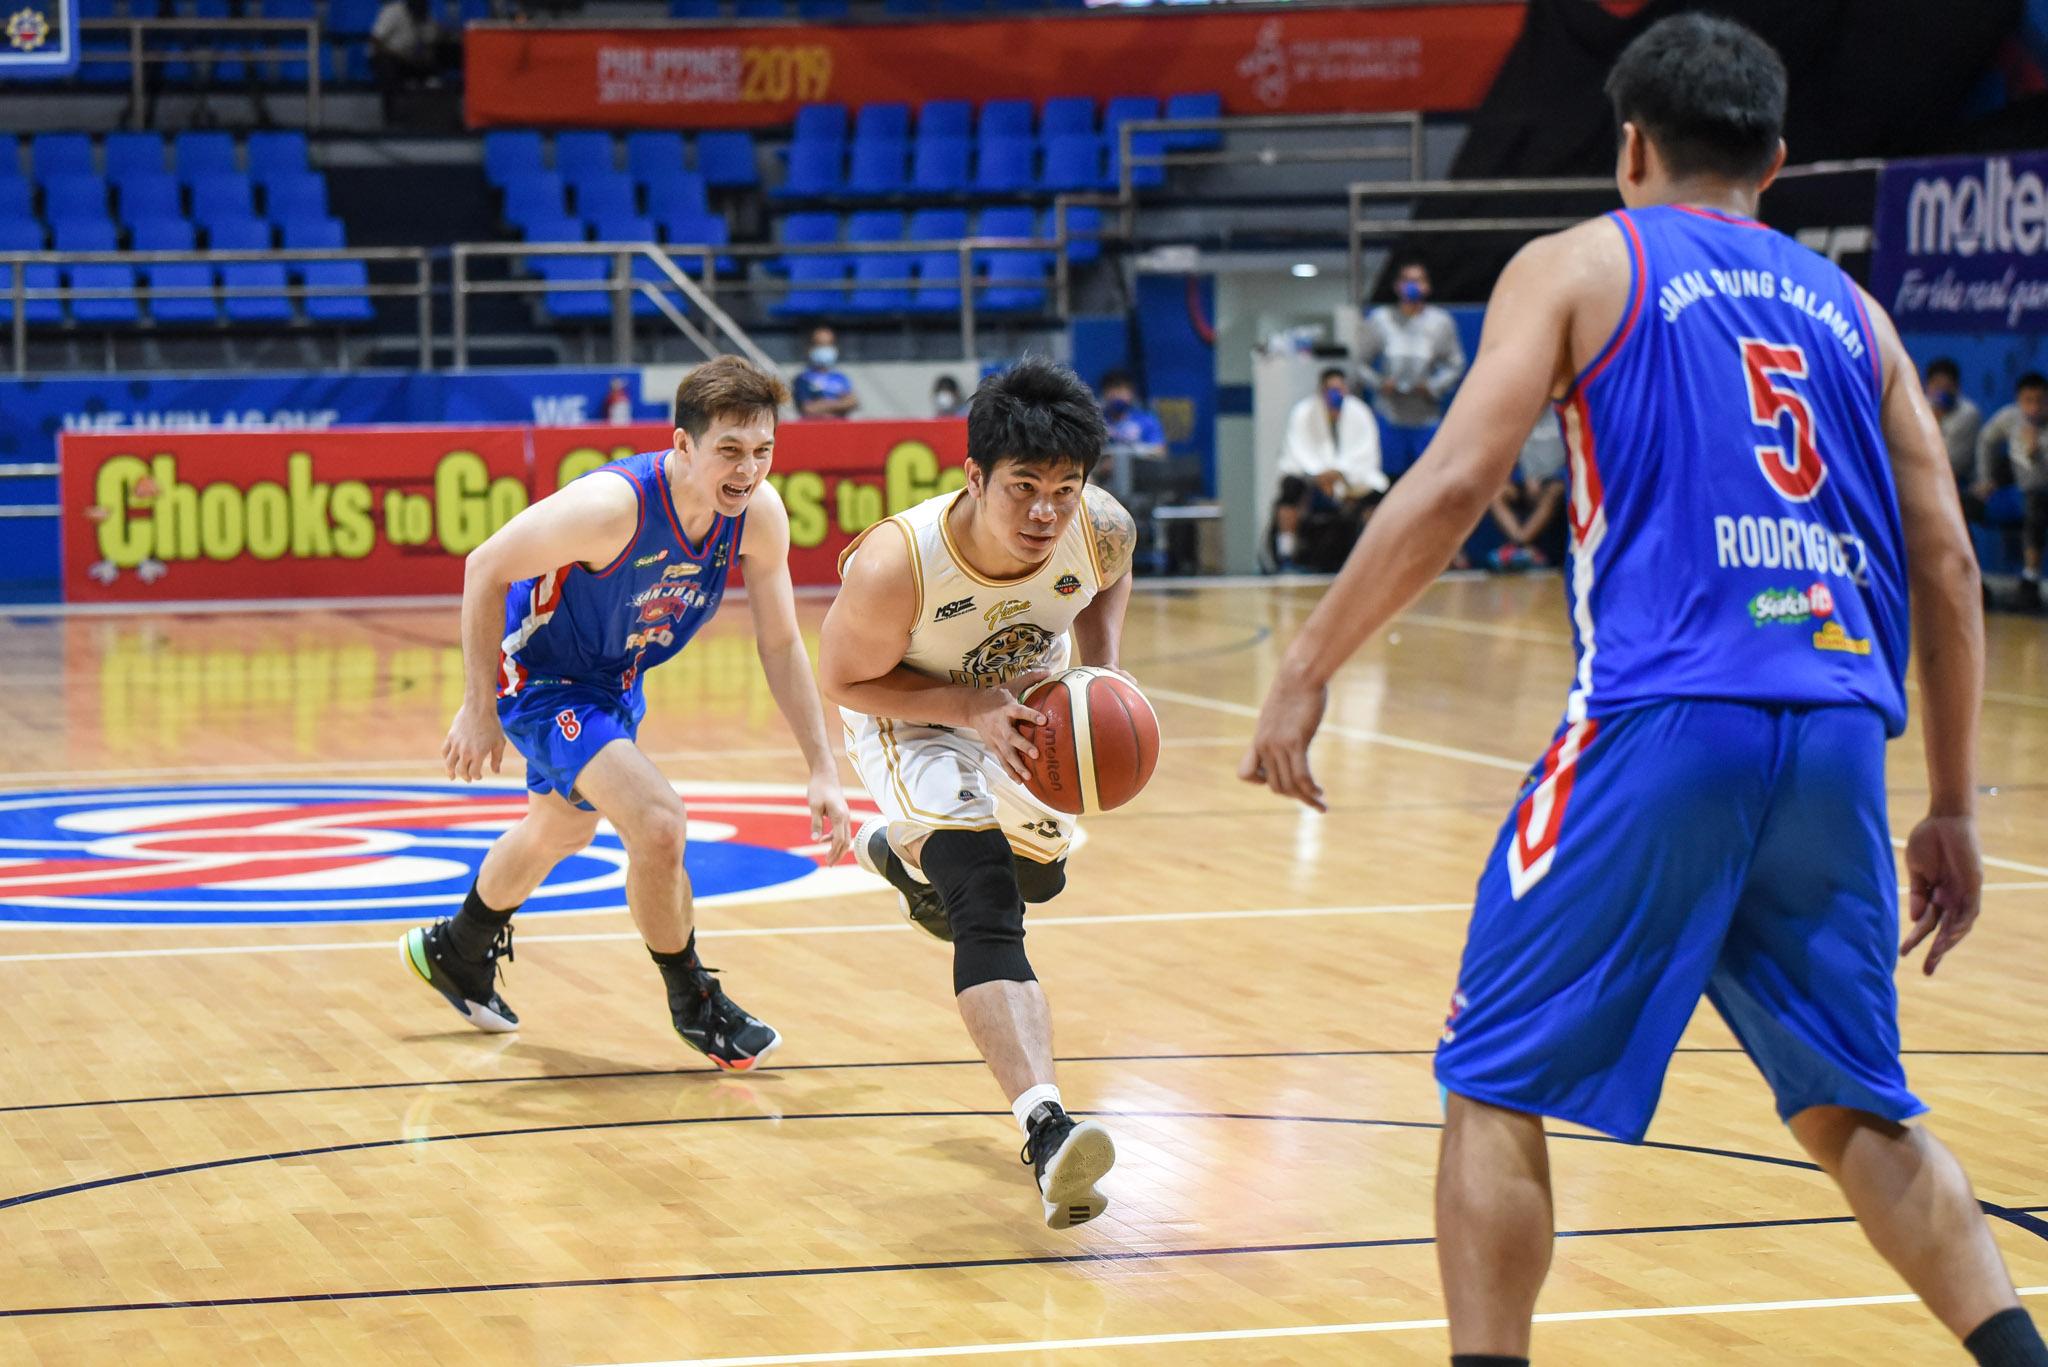 2021-Chooks-to-Go-MPBL-Lakan-Finals-Game-One-Davao-Occi-def-San-Juan-Bonbon-Custodio Calo, Custodio earn praise from Davao Occi, Dillinger for late-game heroics Basketball MPBL News  - philippine sports news